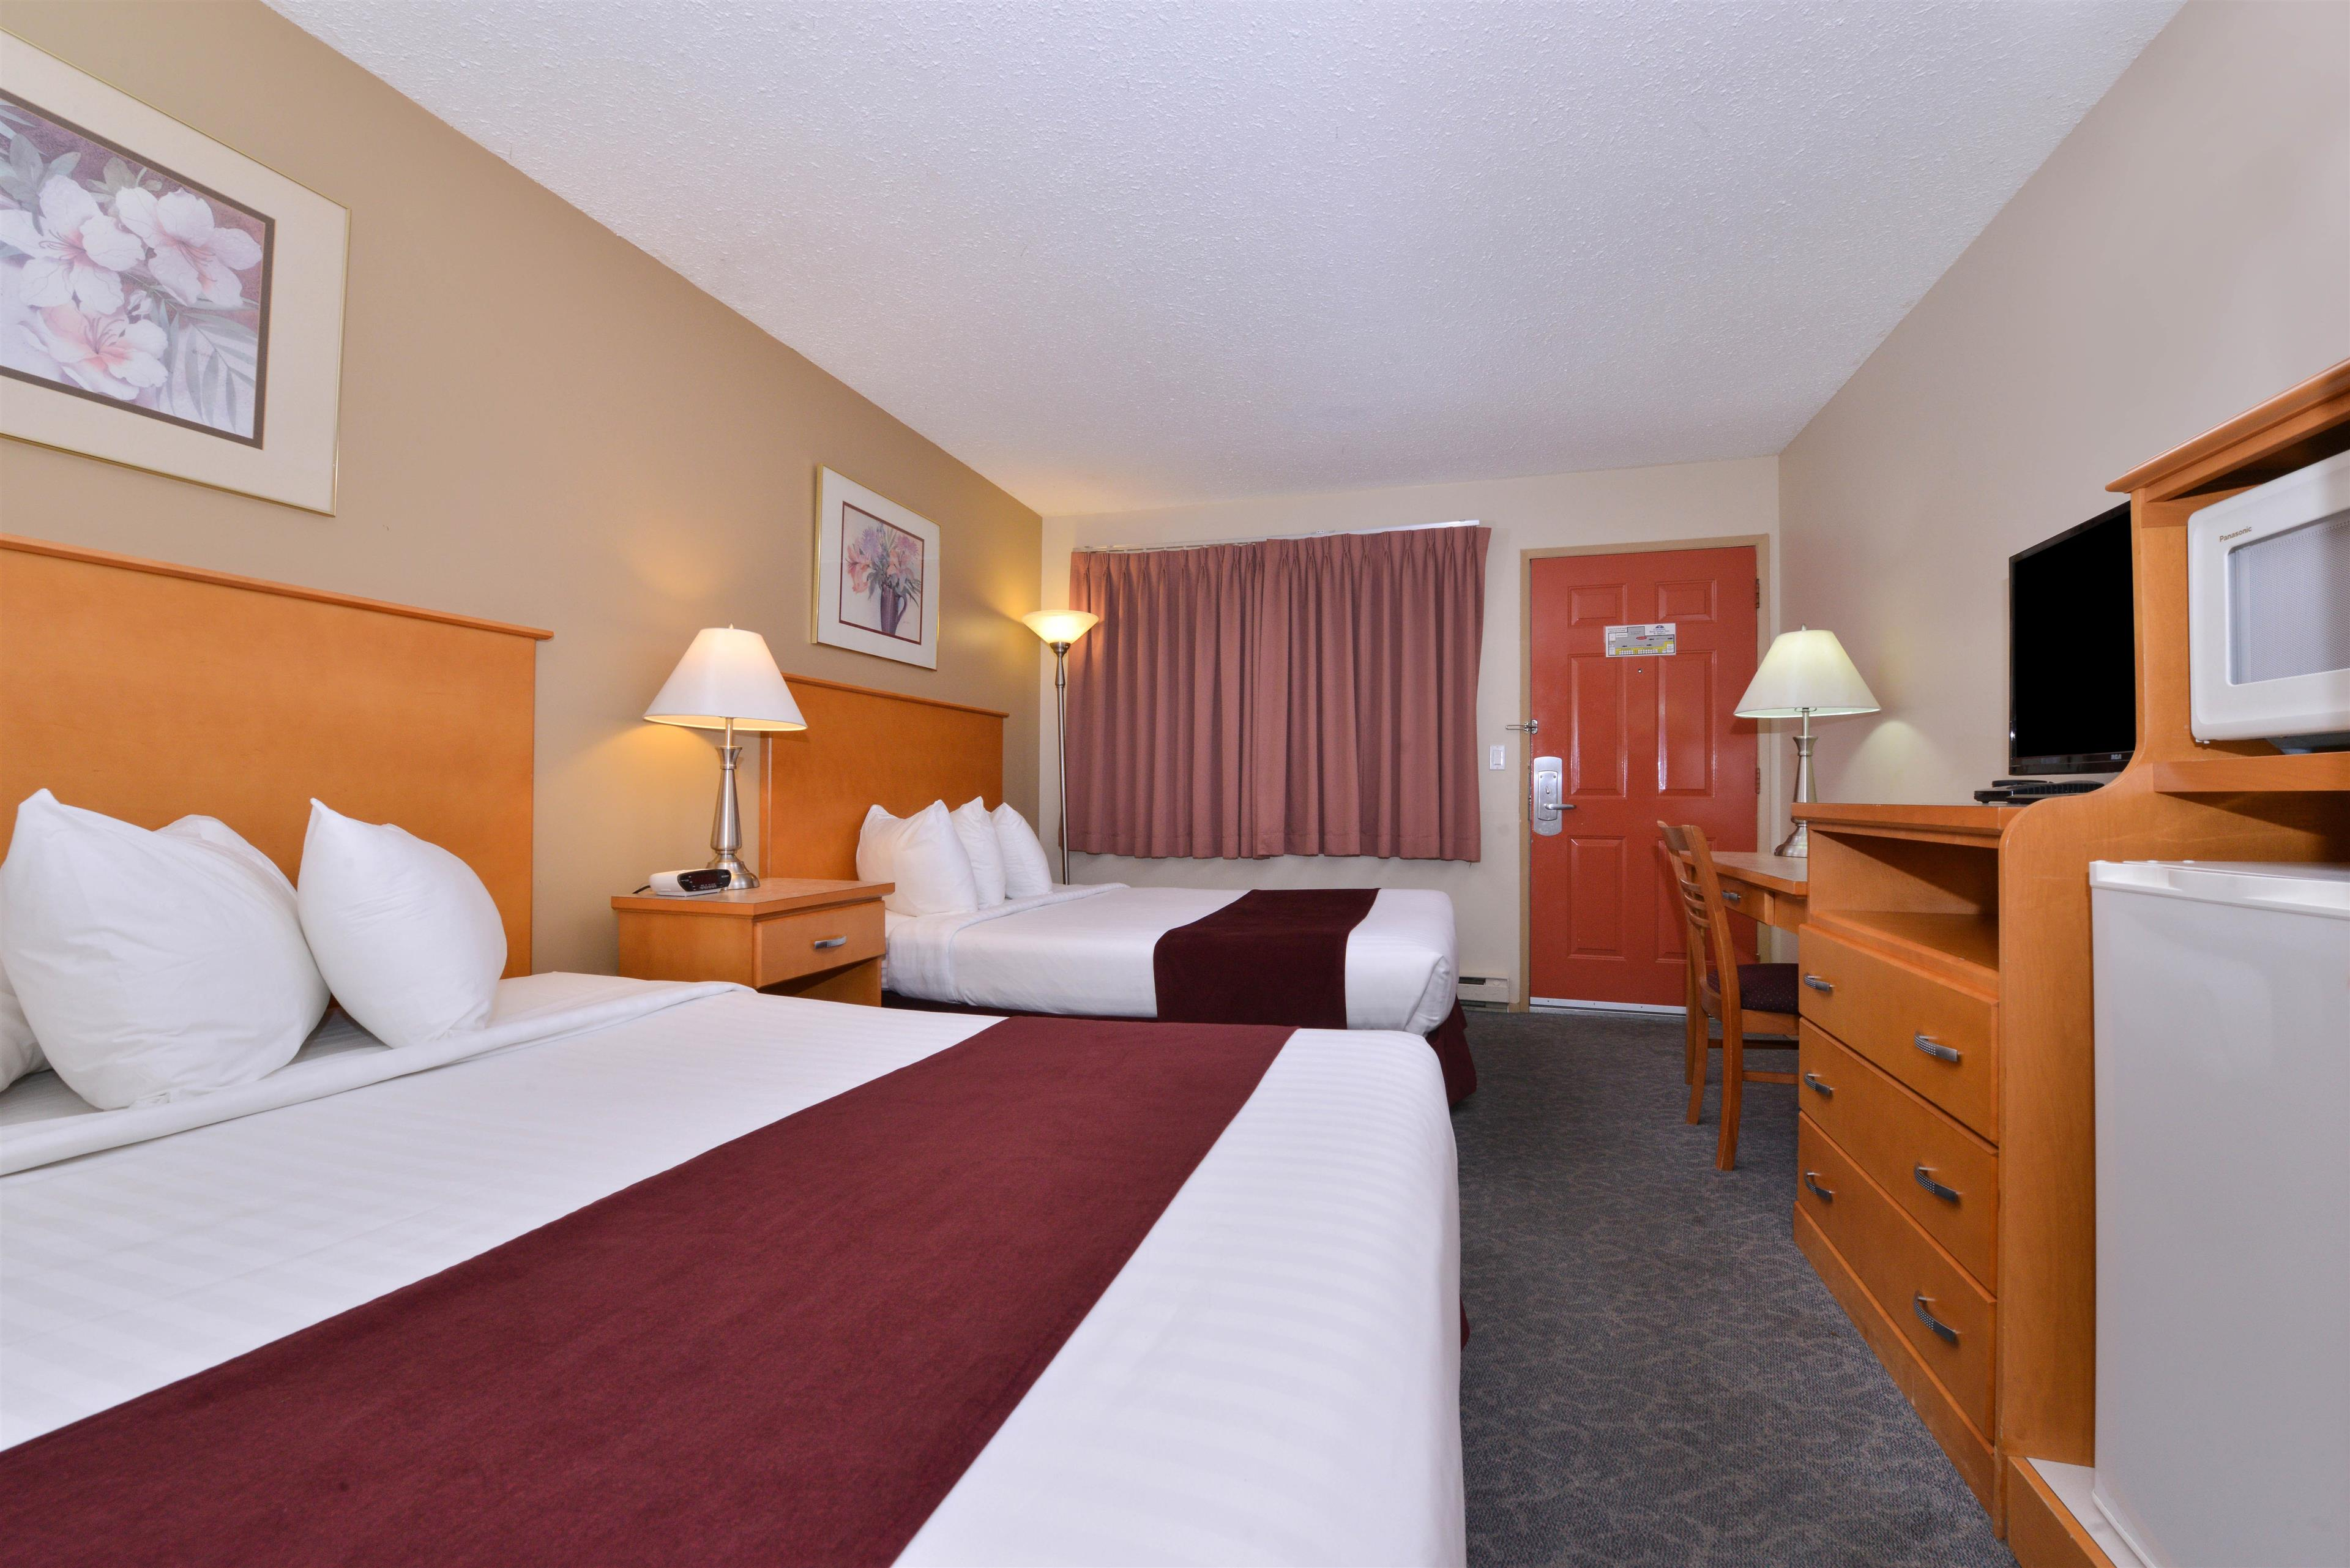 Canadas Best Value Inn & Suites Vernon in Vernon: Two Queen Beds